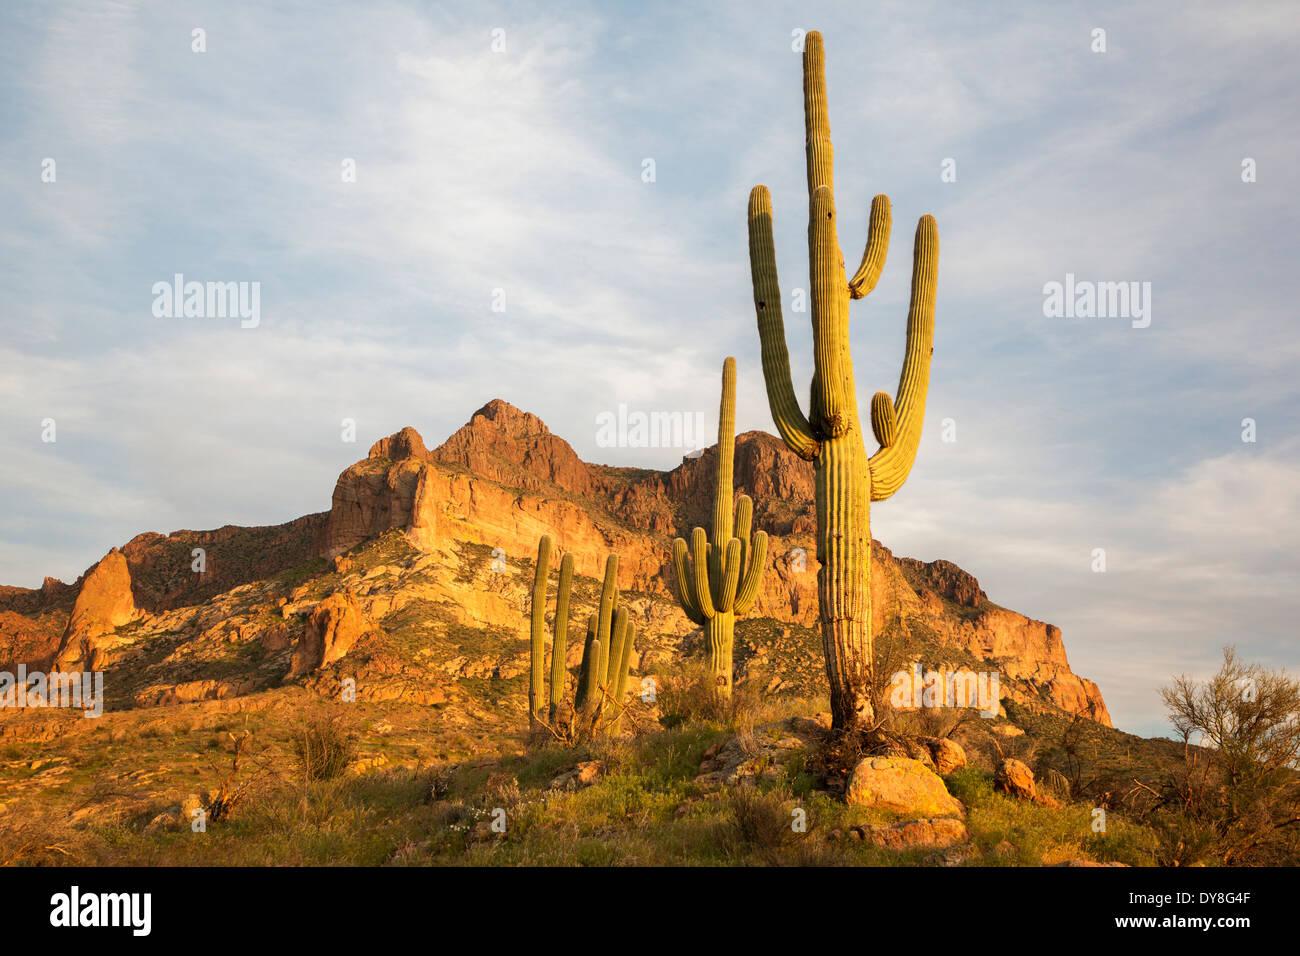 USA, Arizona, Tonto National Forest, Picketpost Mountain with saguaro. - Stock Image